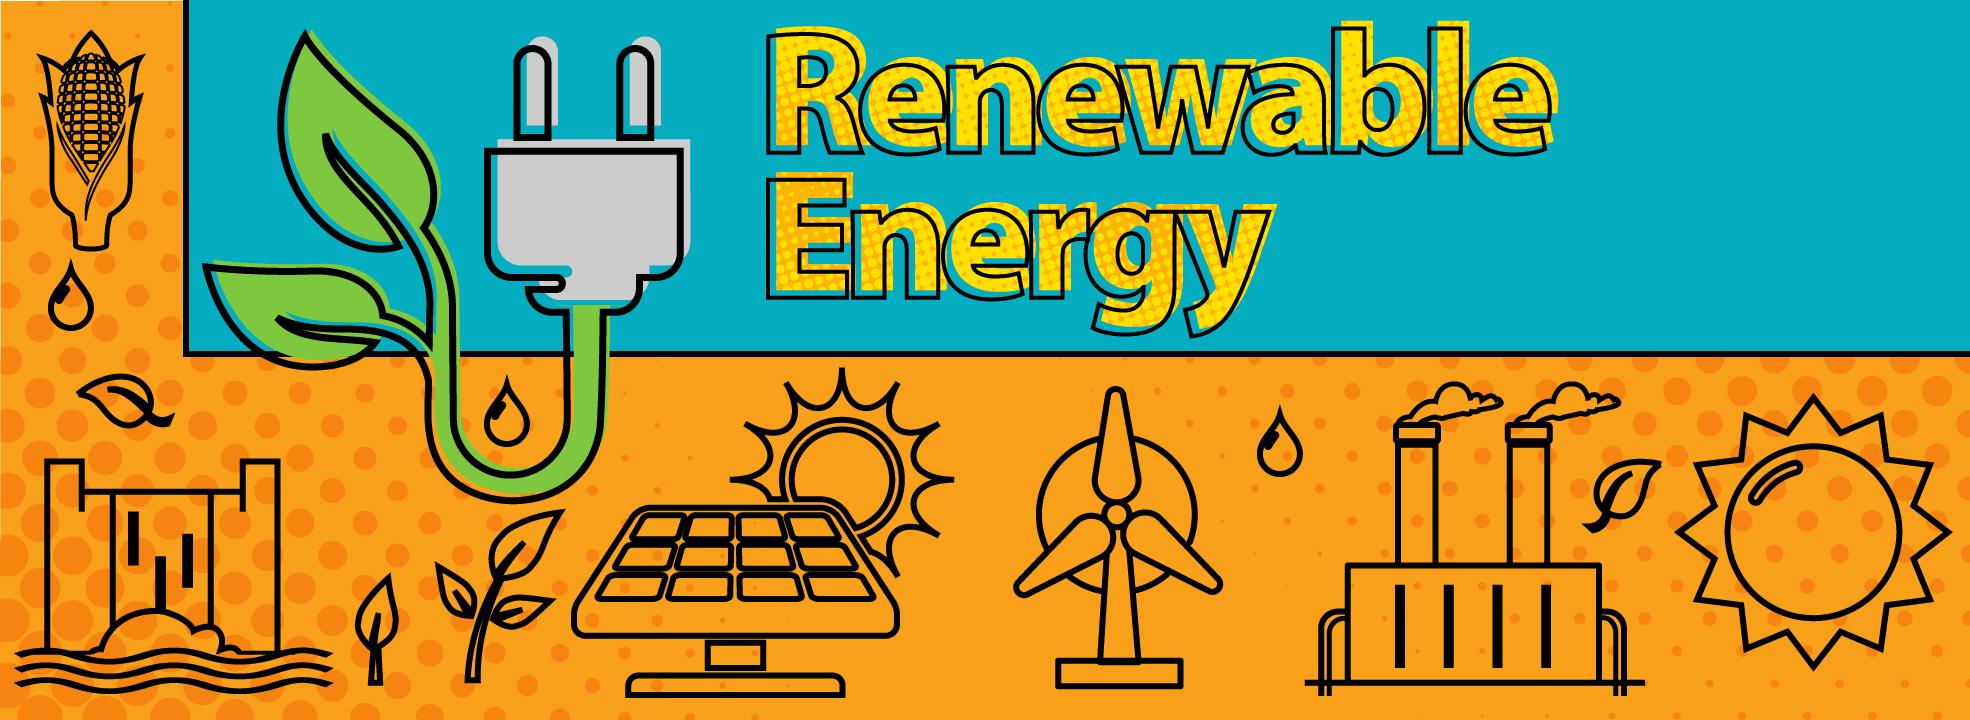 66403 Renewable Energy landing bnr 1970x720